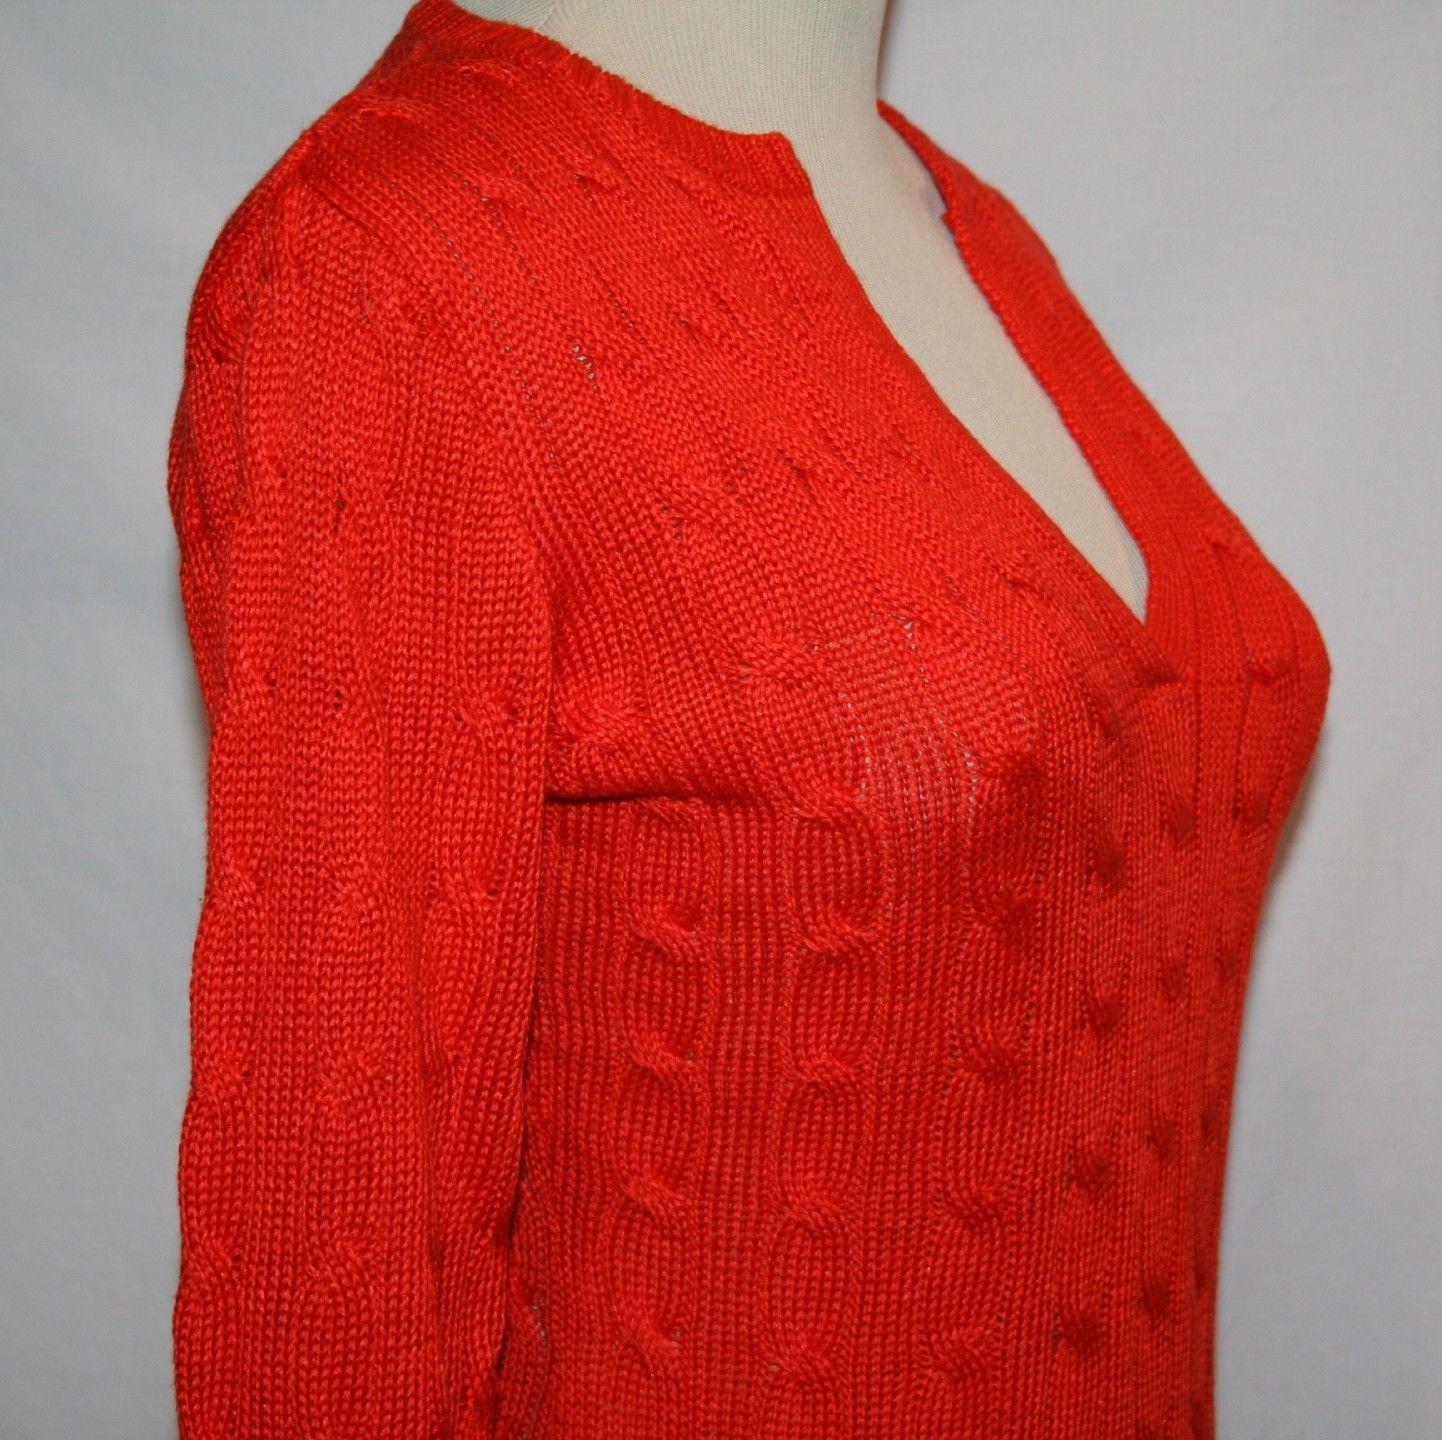 RALPH LAUREN BLACK LABEL Linen Silk Cable Knit Orange Sweater Small    1210